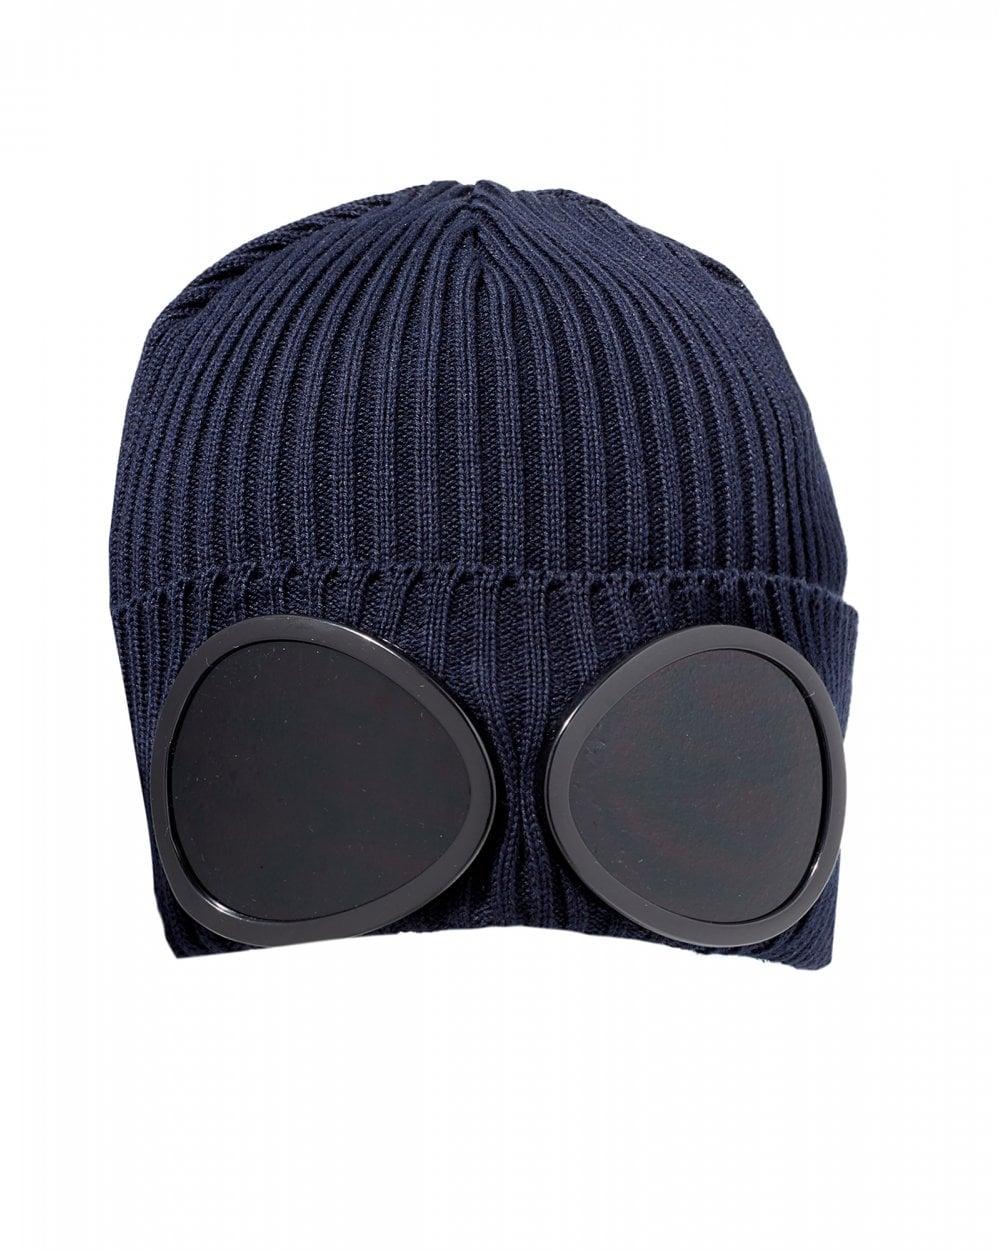 3b163496f Mens Large Goggle Beanie, Navy Blue Hat